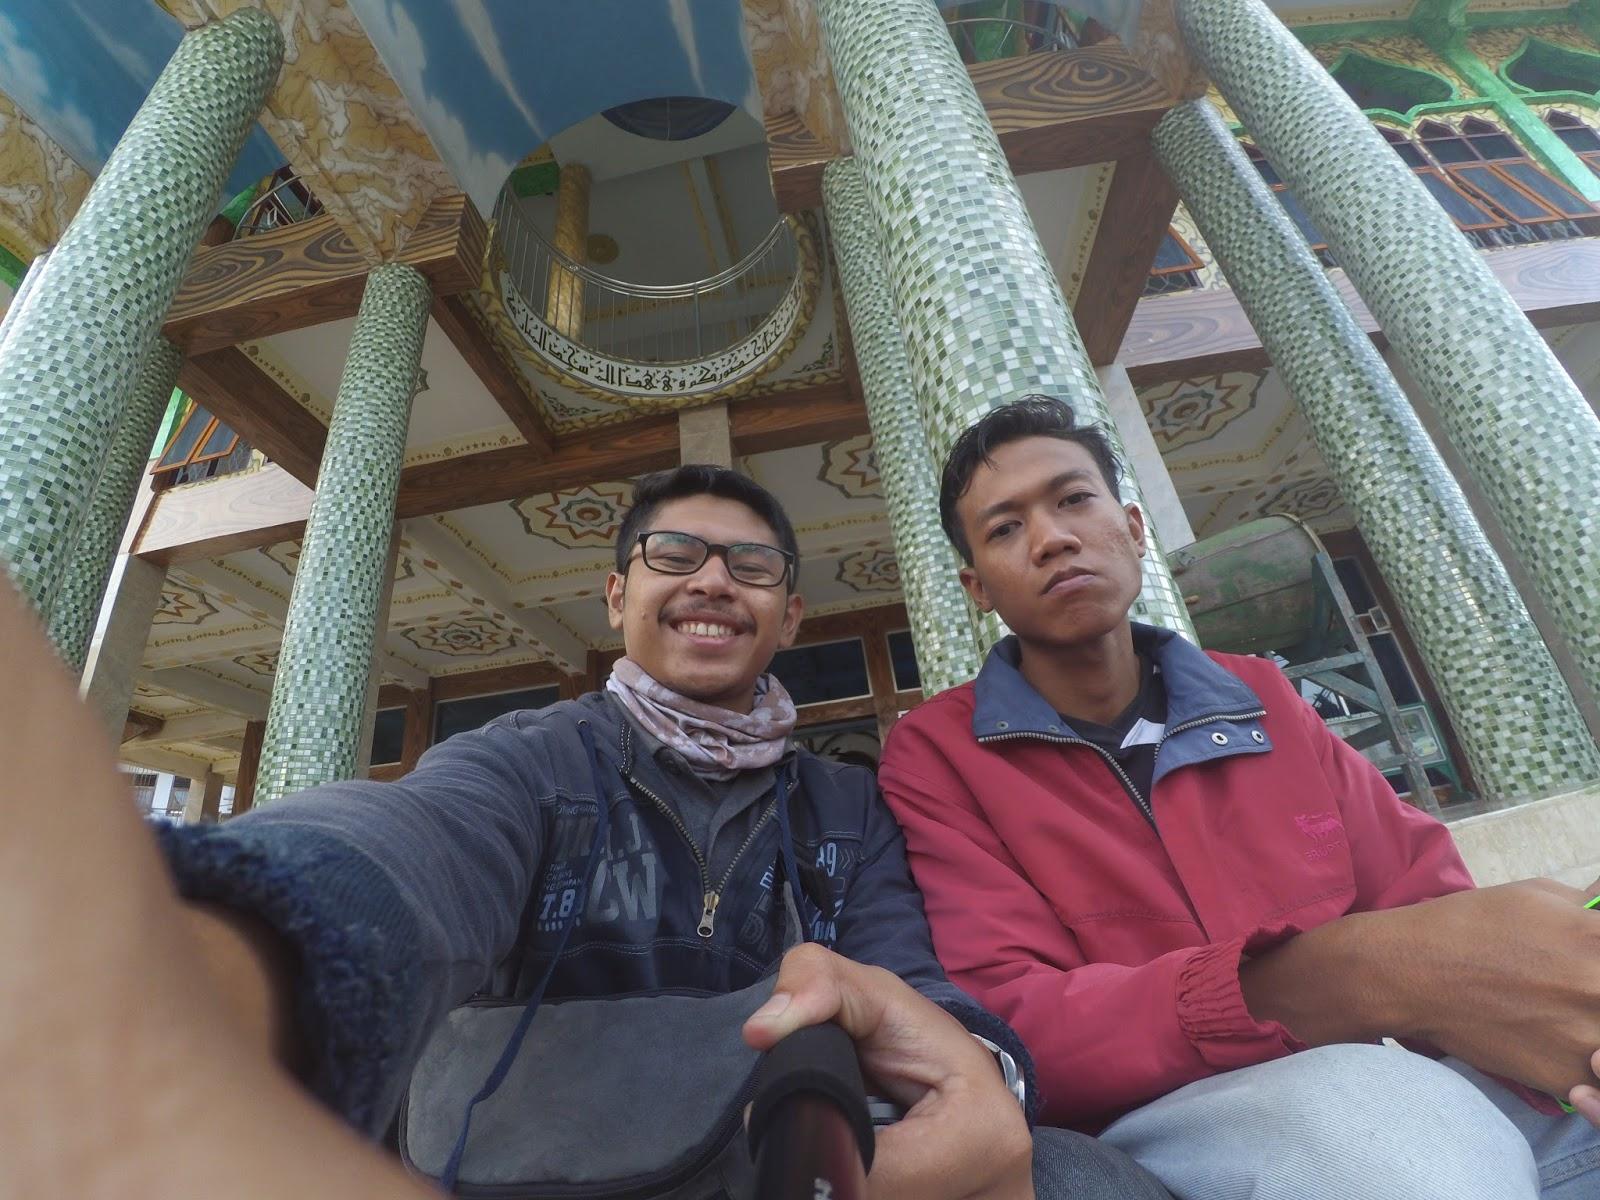 Selfie sama Liba Masjid Besar Gilimanuk Bali